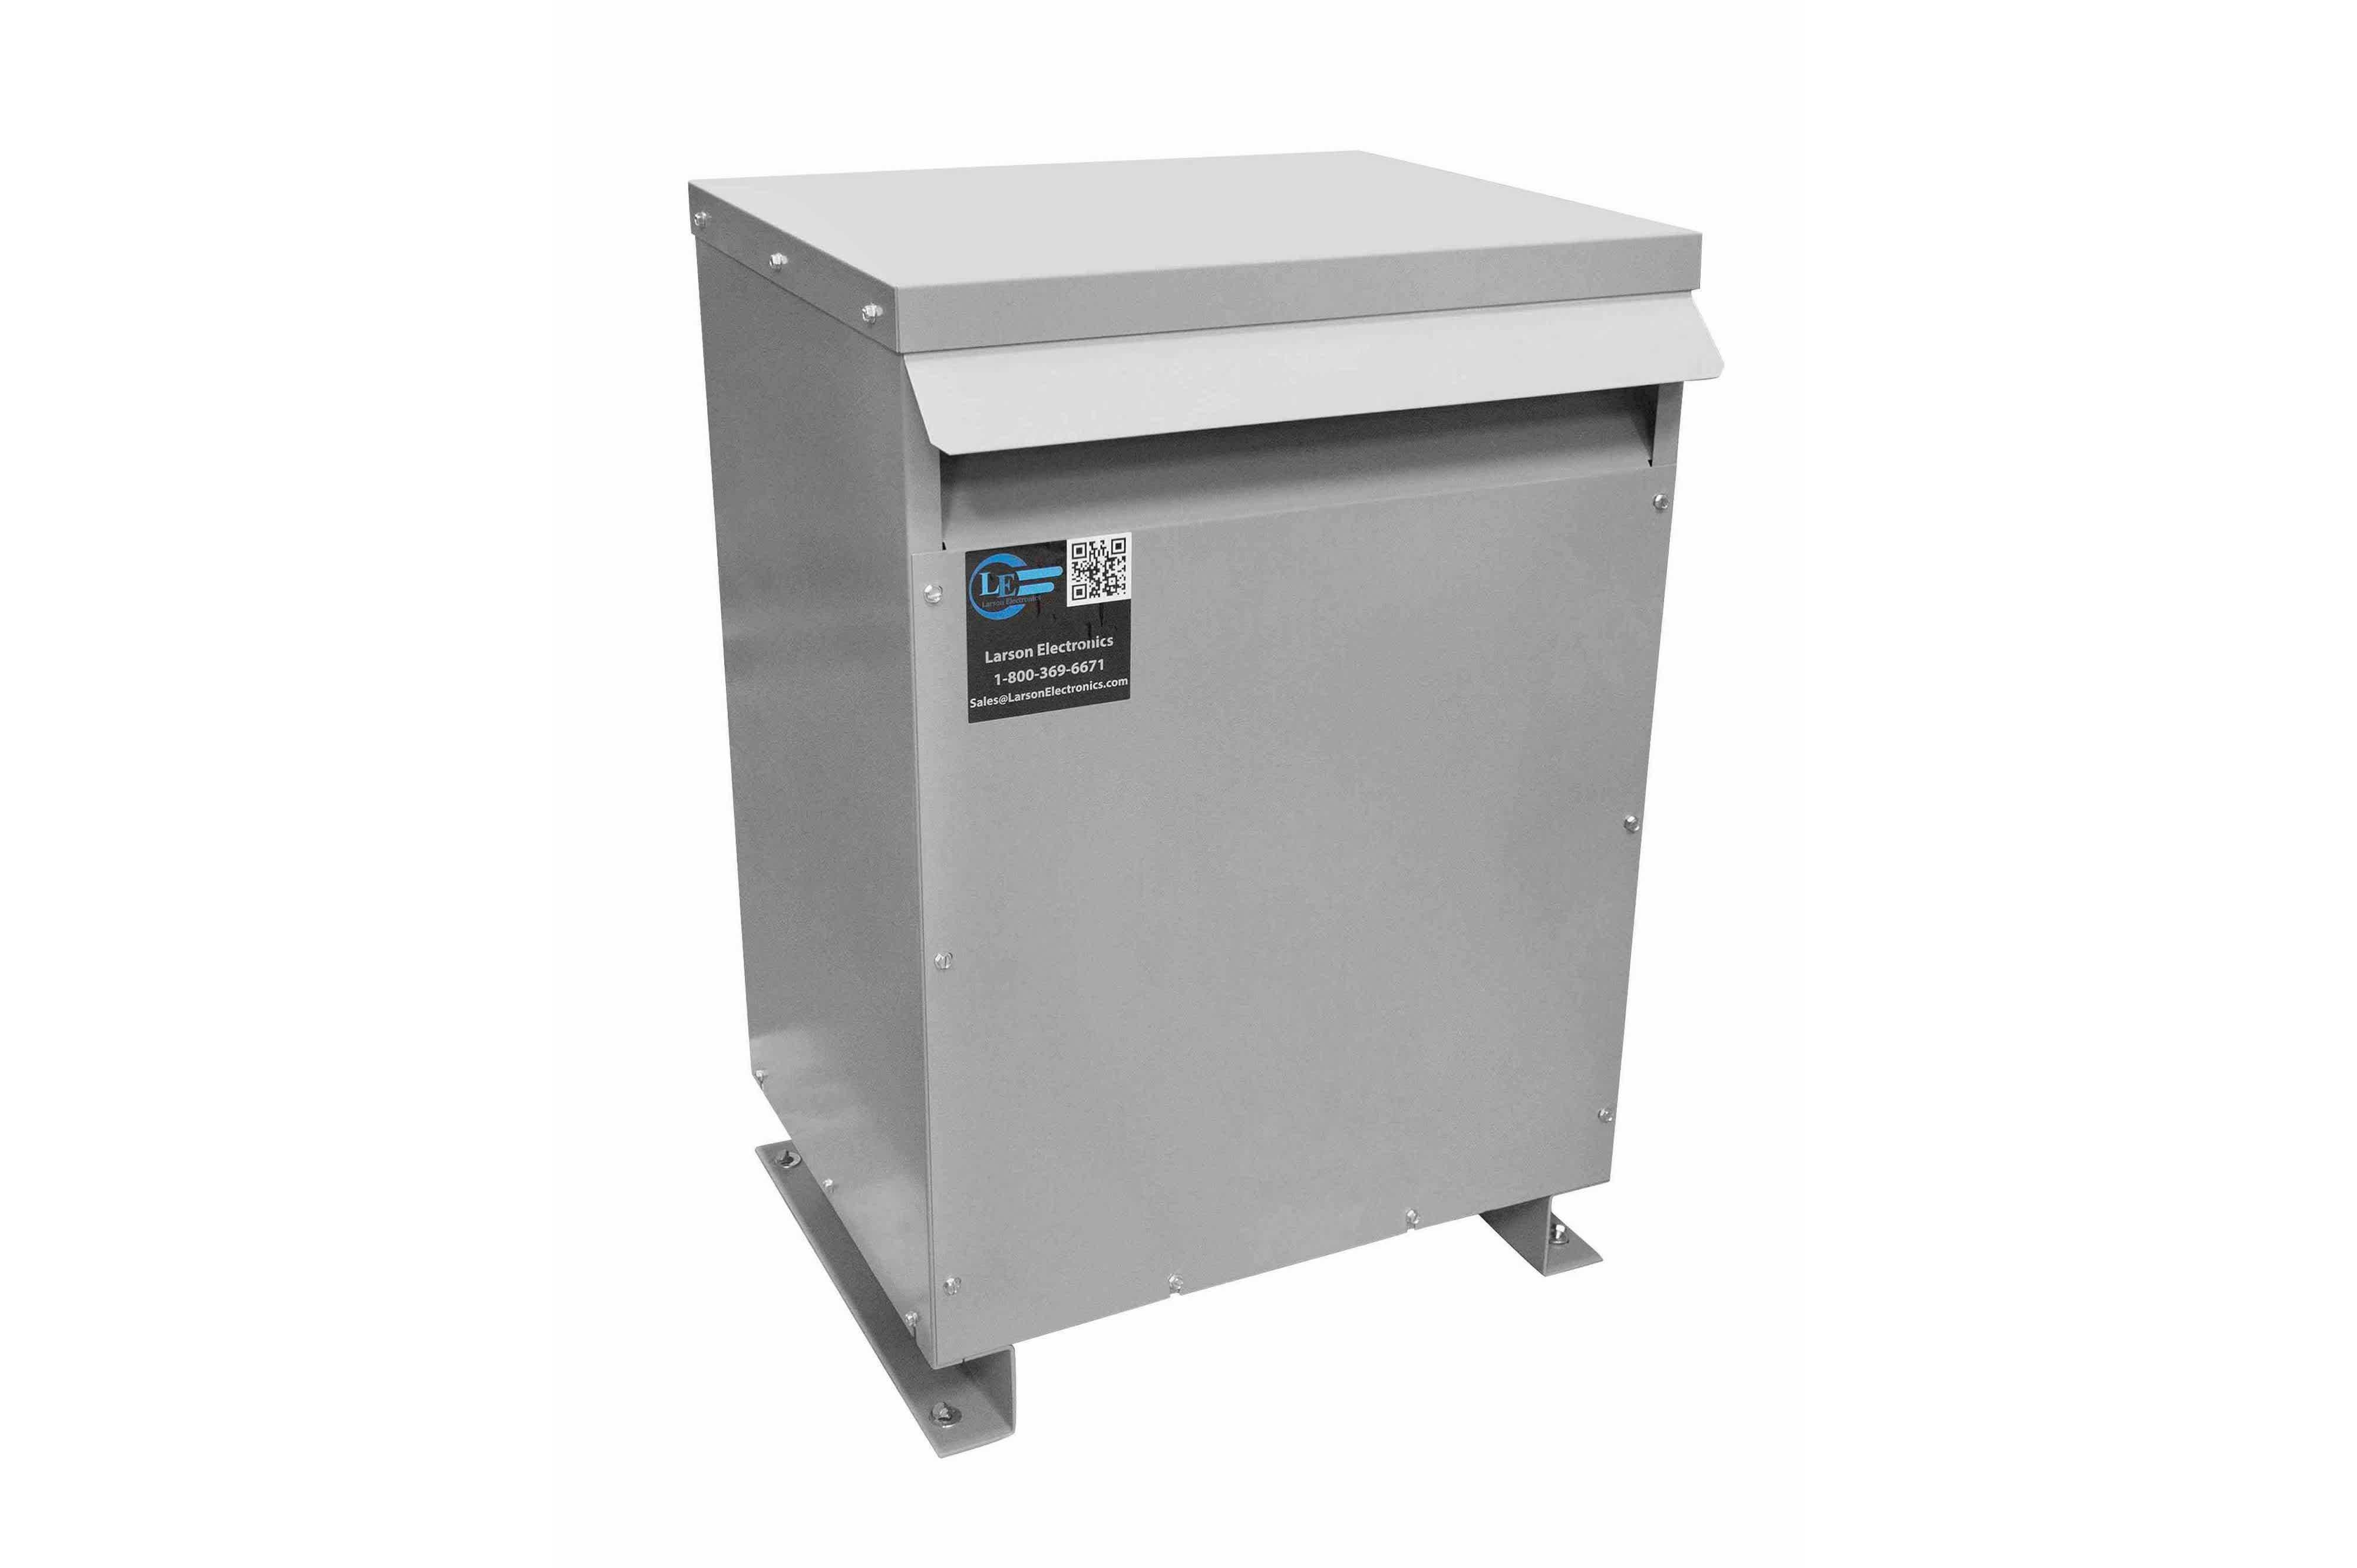 200 kVA 3PH Isolation Transformer, 600V Wye Primary, 208Y/120 Wye-N Secondary, N3R, Ventilated, 60 Hz